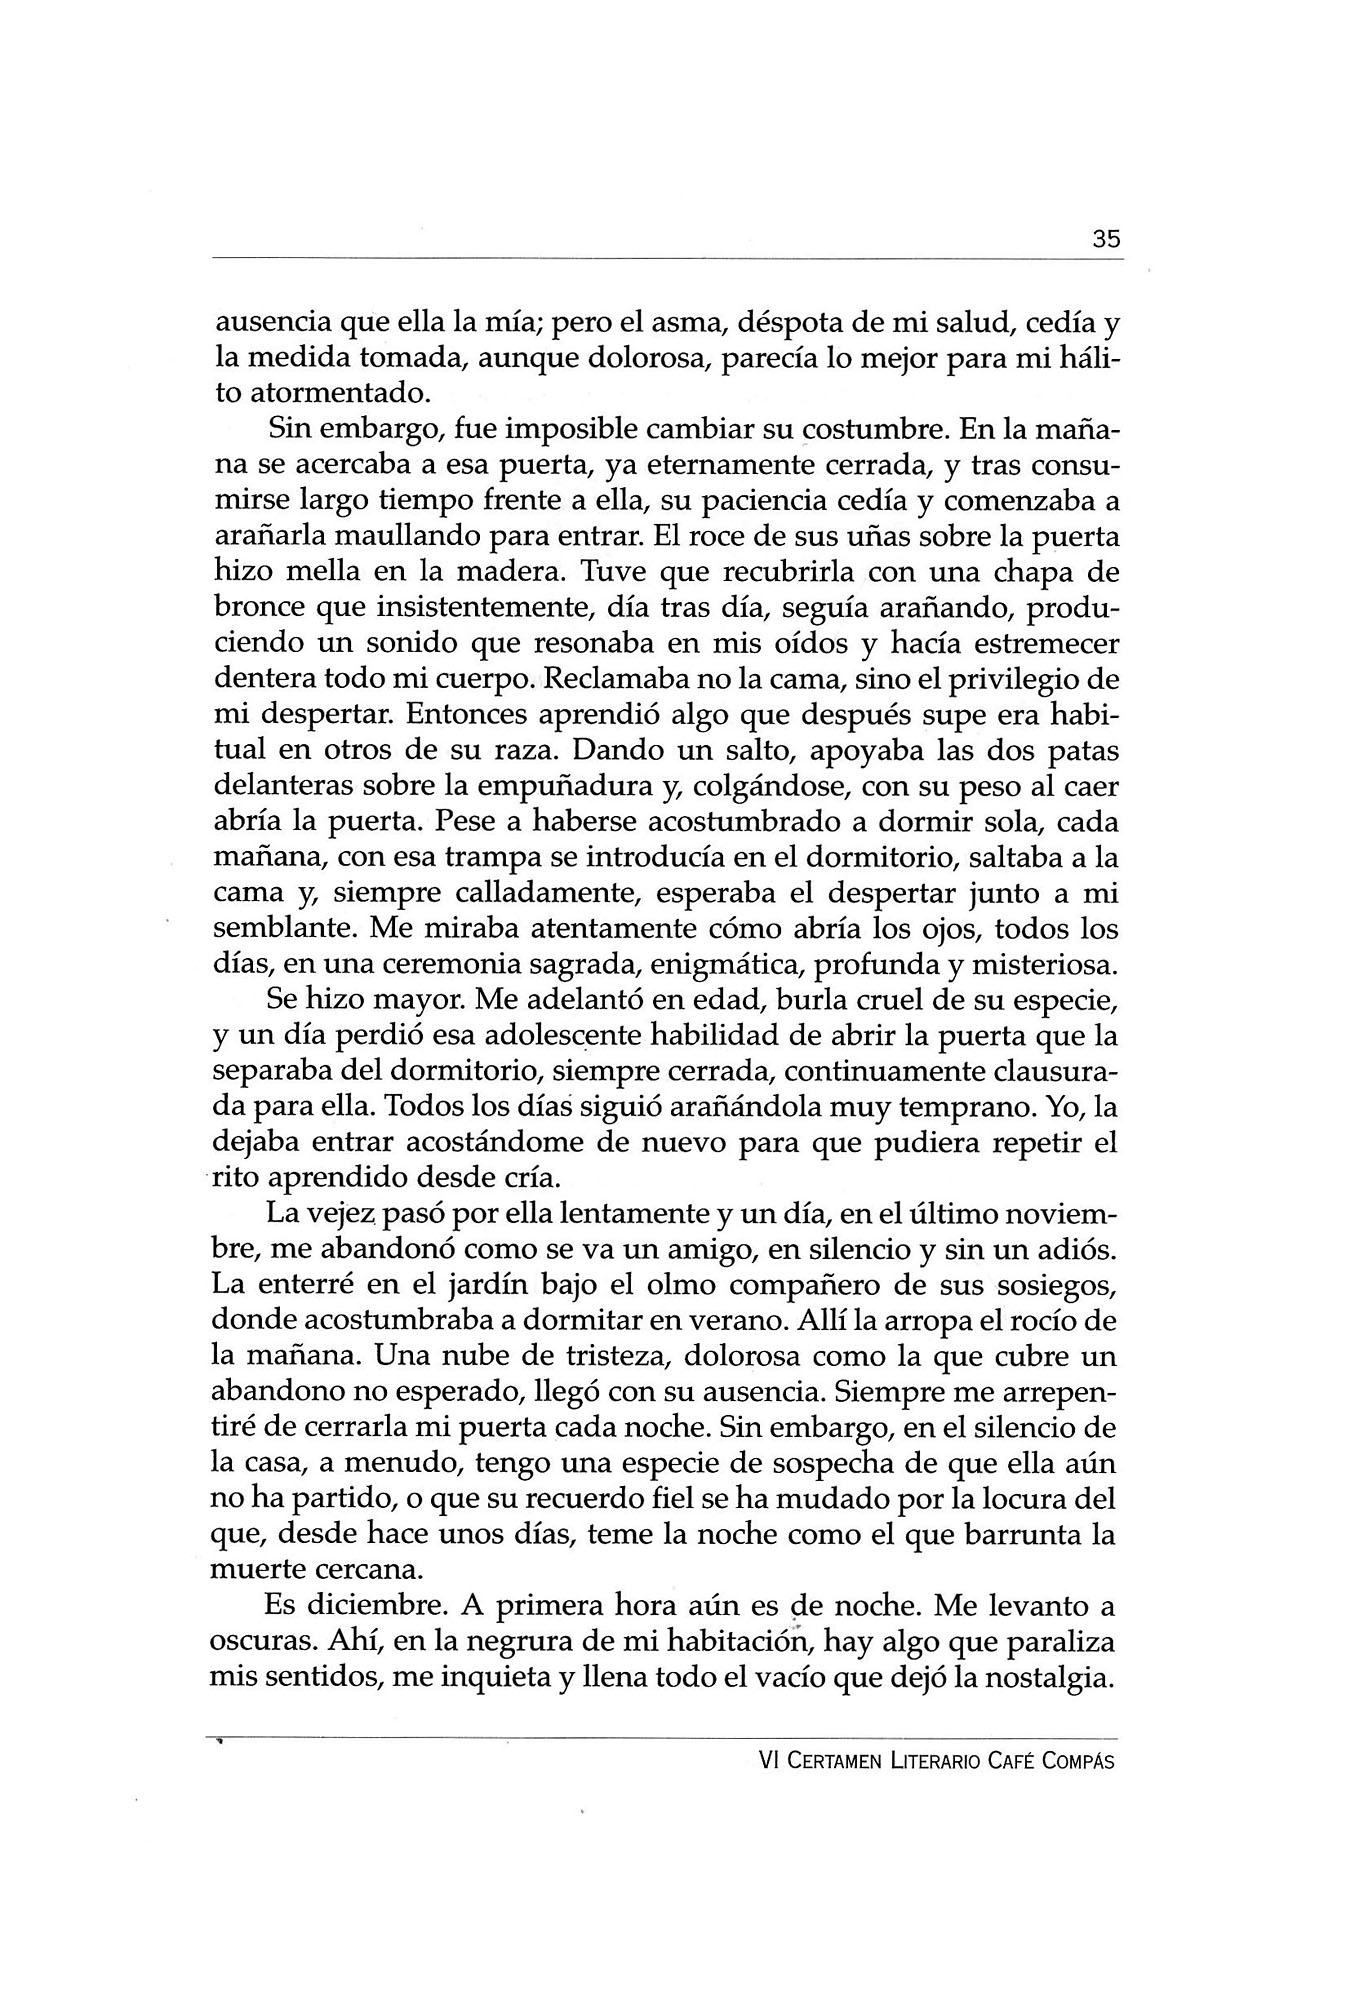 danielvillalobos-calderonsamaniego-shortstory-spanishliterature-6